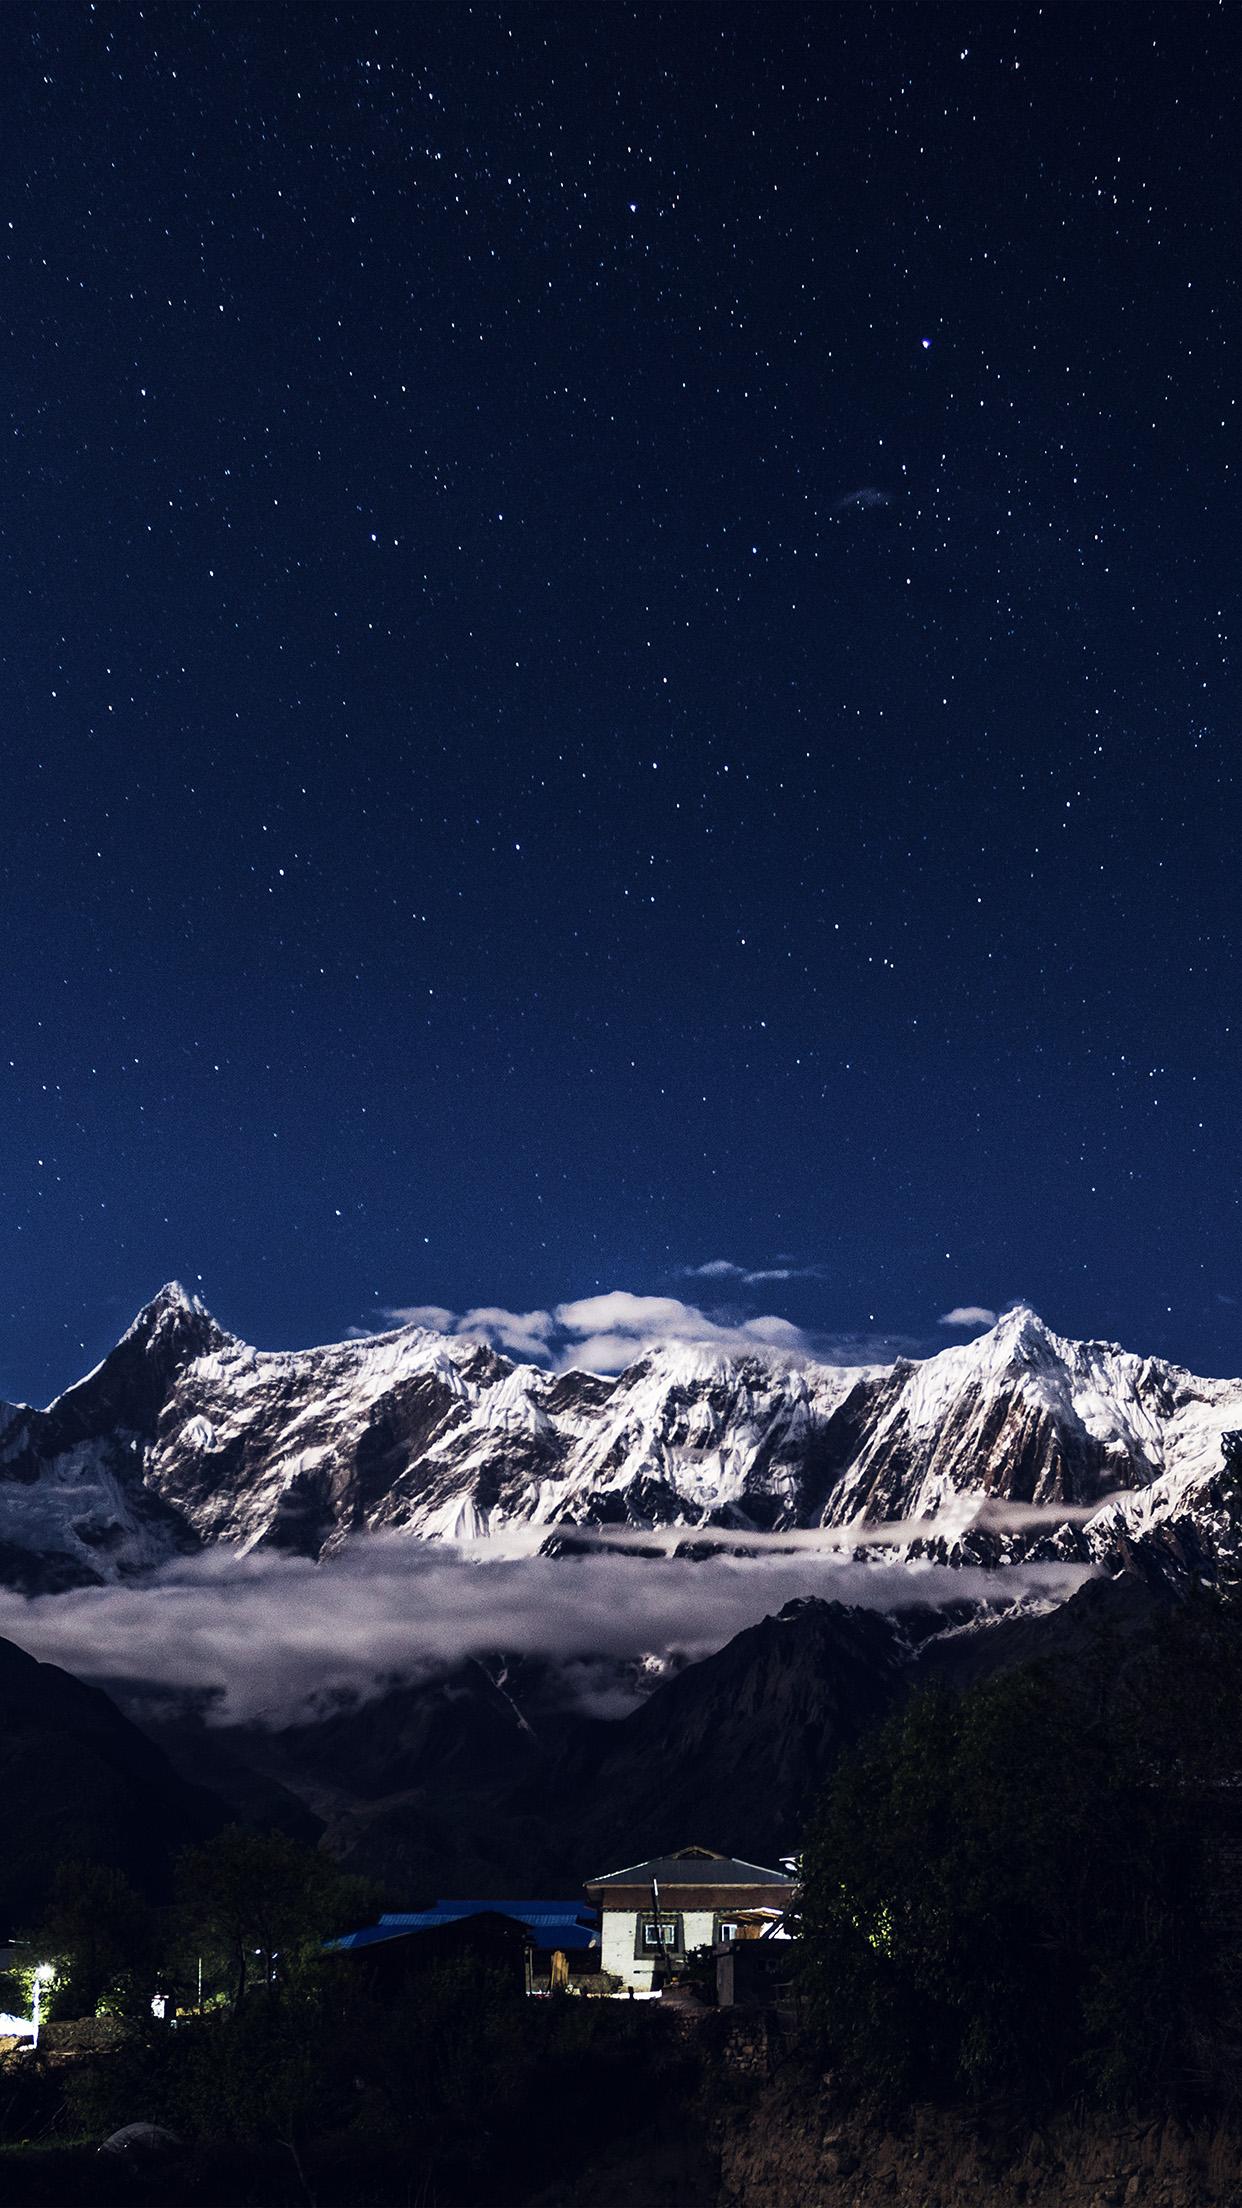 Nk75 Night Mountain Blue Sky Space Star Dark Wallpaper